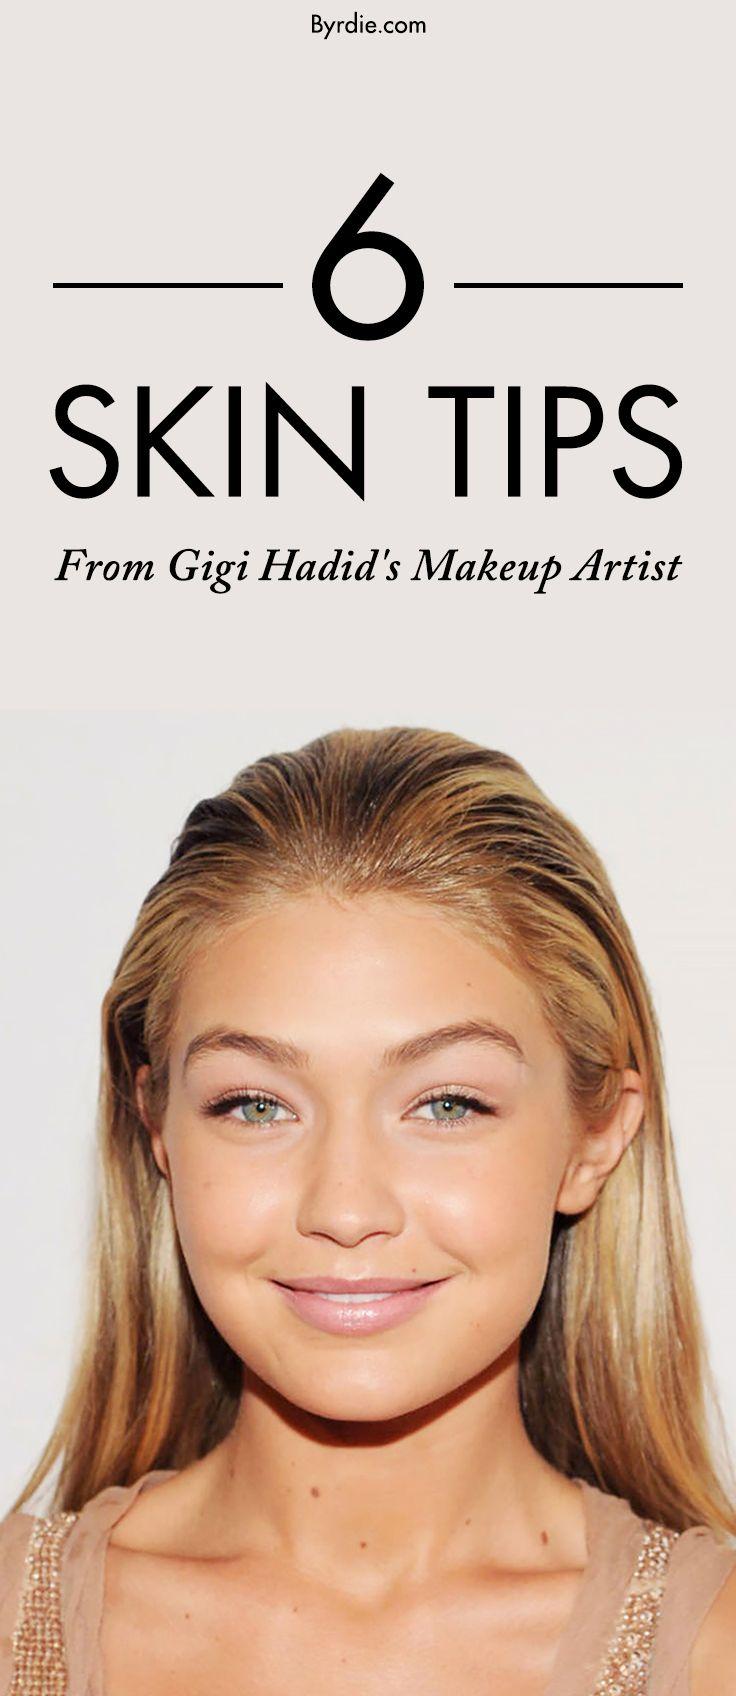 Gigi Hadid's Makeup Artist Shares His Tips and Tricks for TravelBeauty